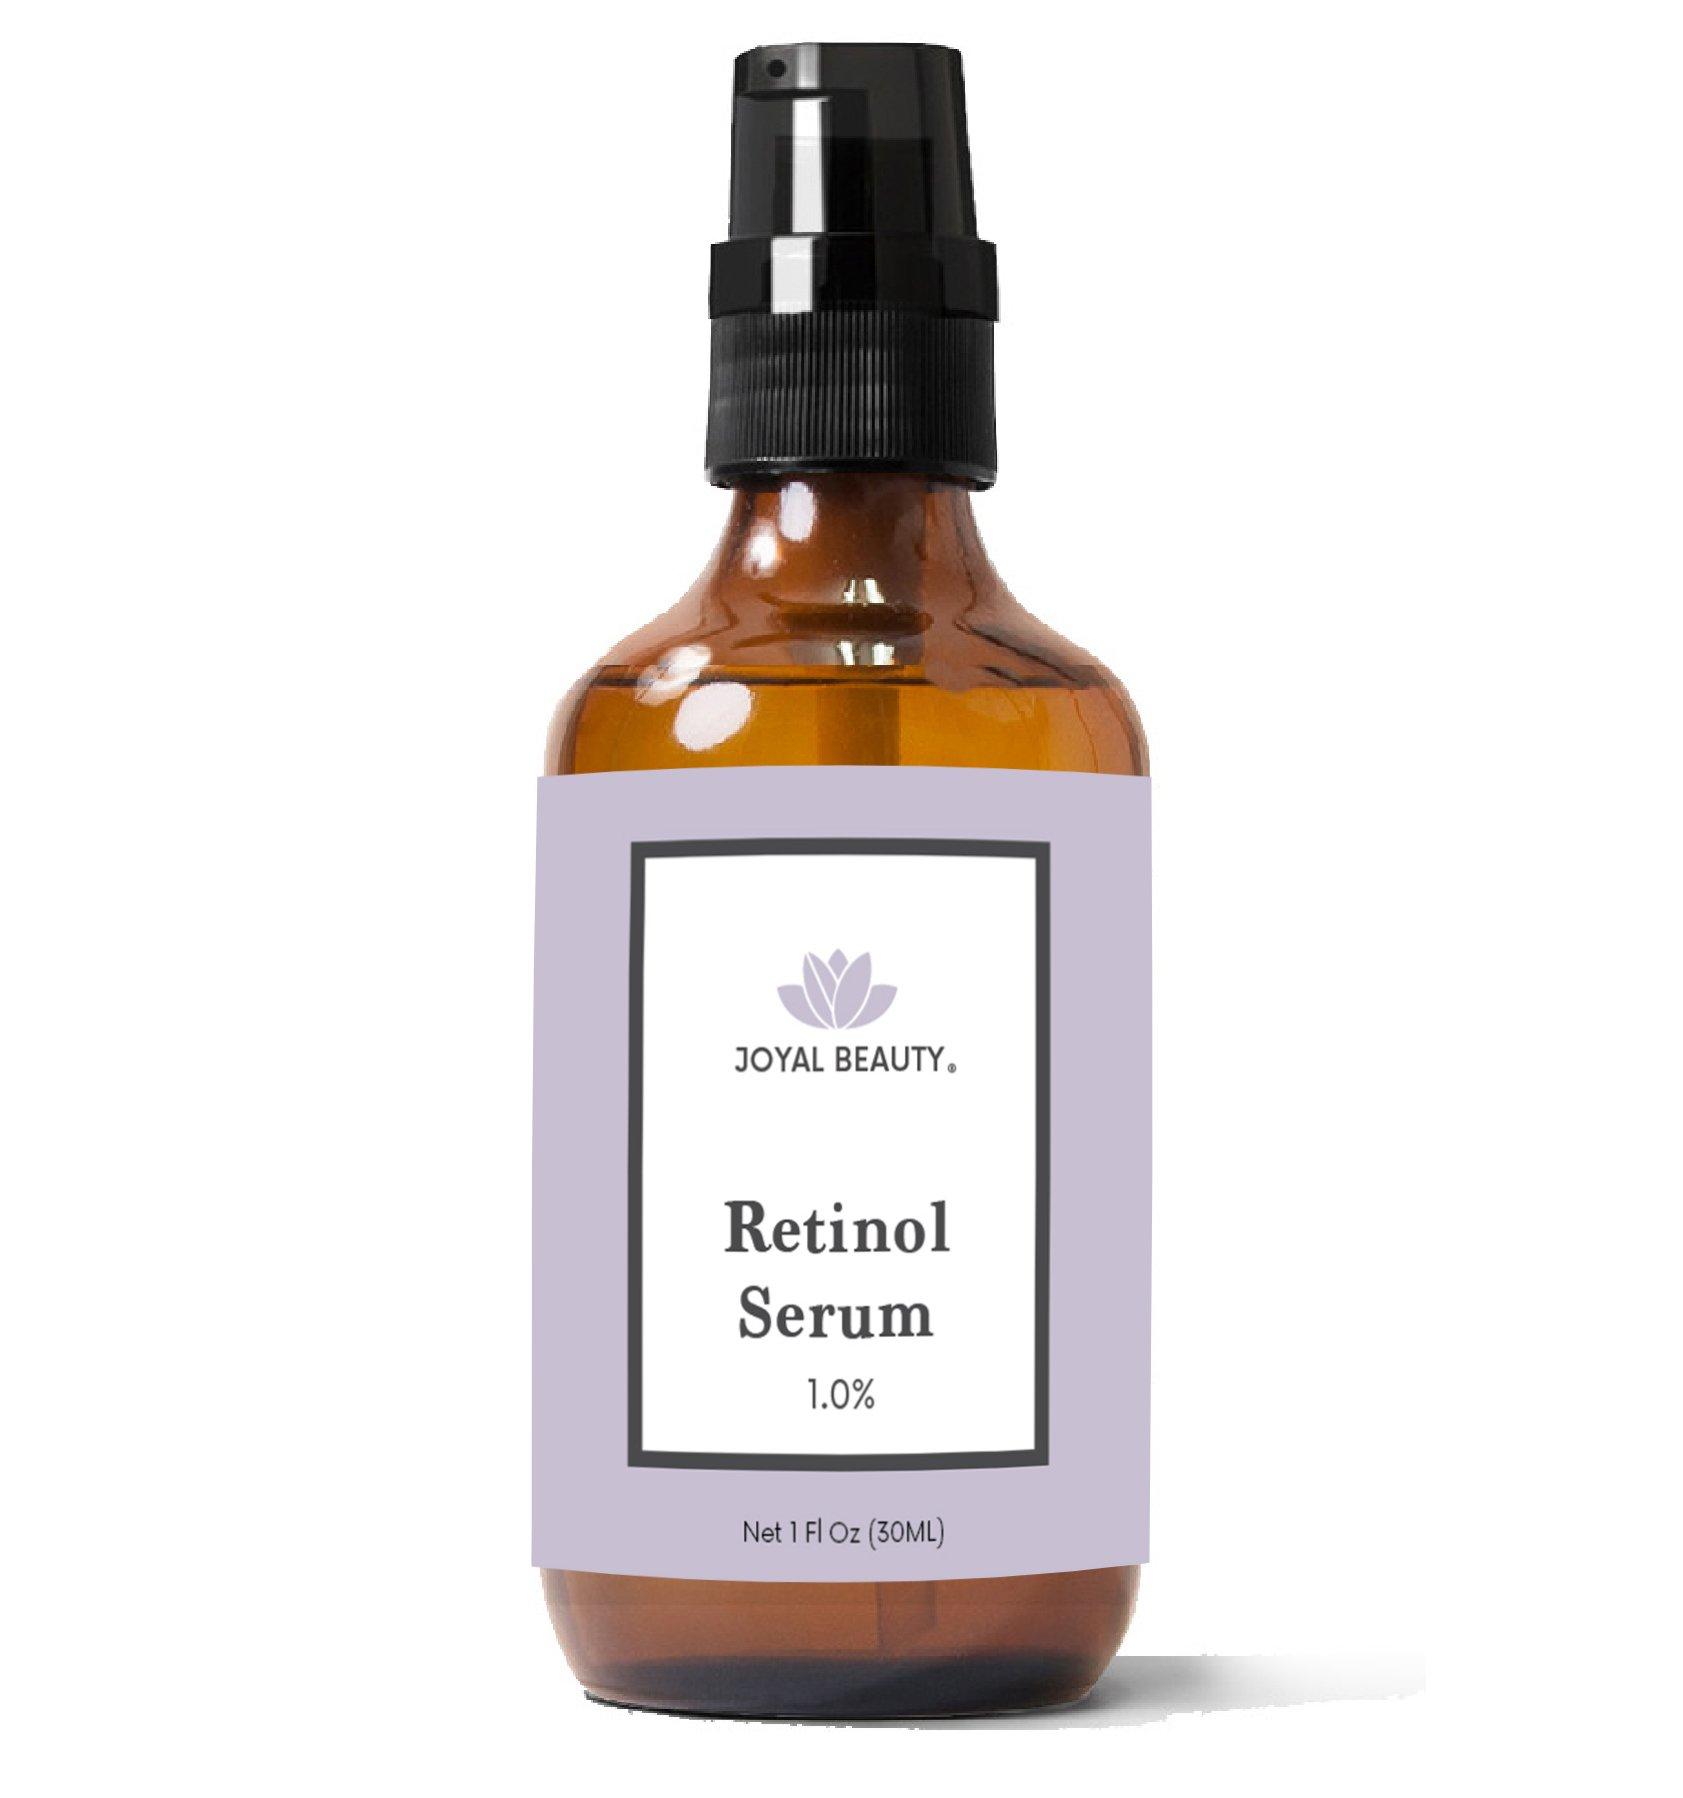 Joyal Beauty Organic Retinol Serum for Face Skin Eyes. Best for Anti-Aging Firming Fine Lines Anti Wrinkle Acne Pores. Advanced Premium Retinol Night Serum. 1.0%. 1 oz.